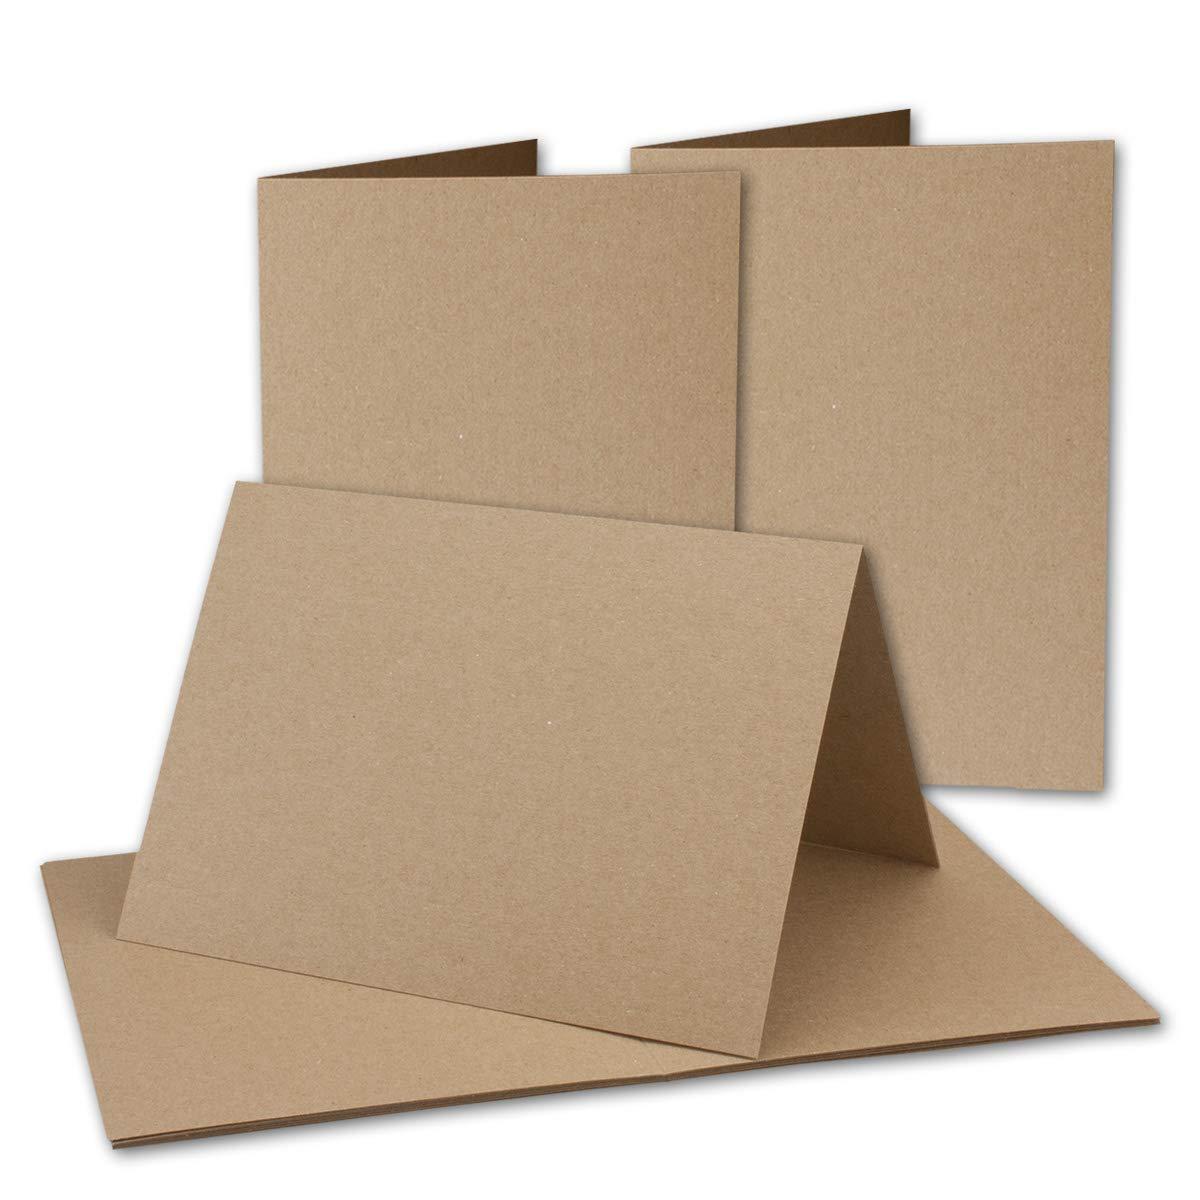 150x Vintage Kraftpapier Falt-Karten DIN A5-148 x 210 mm mm mm - sandbraun - Recycling - 350 g m² blanko Bastel-Karten I Umwelt by Gustav NEUSER® B01EMZA2FG | Auf Verkauf  b66b4e